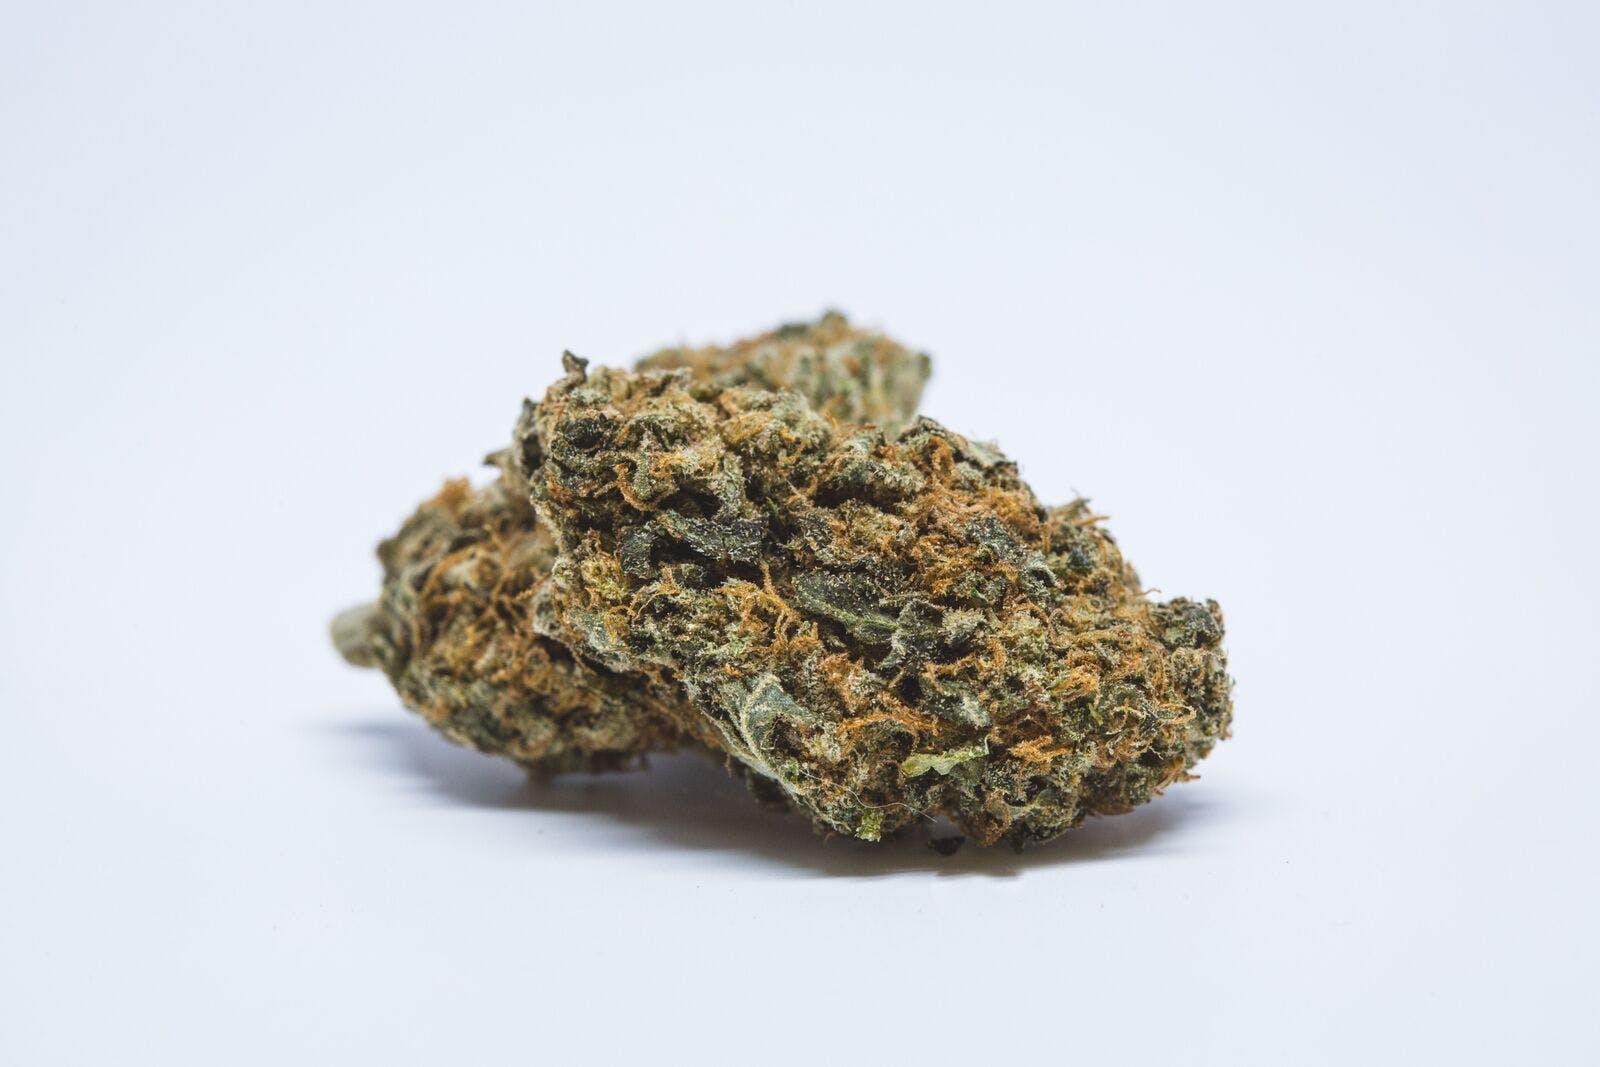 Black D.O.G Weed; Black D.O.G Cannabis Strain; Black D.O.G Indica Marijuana Strain